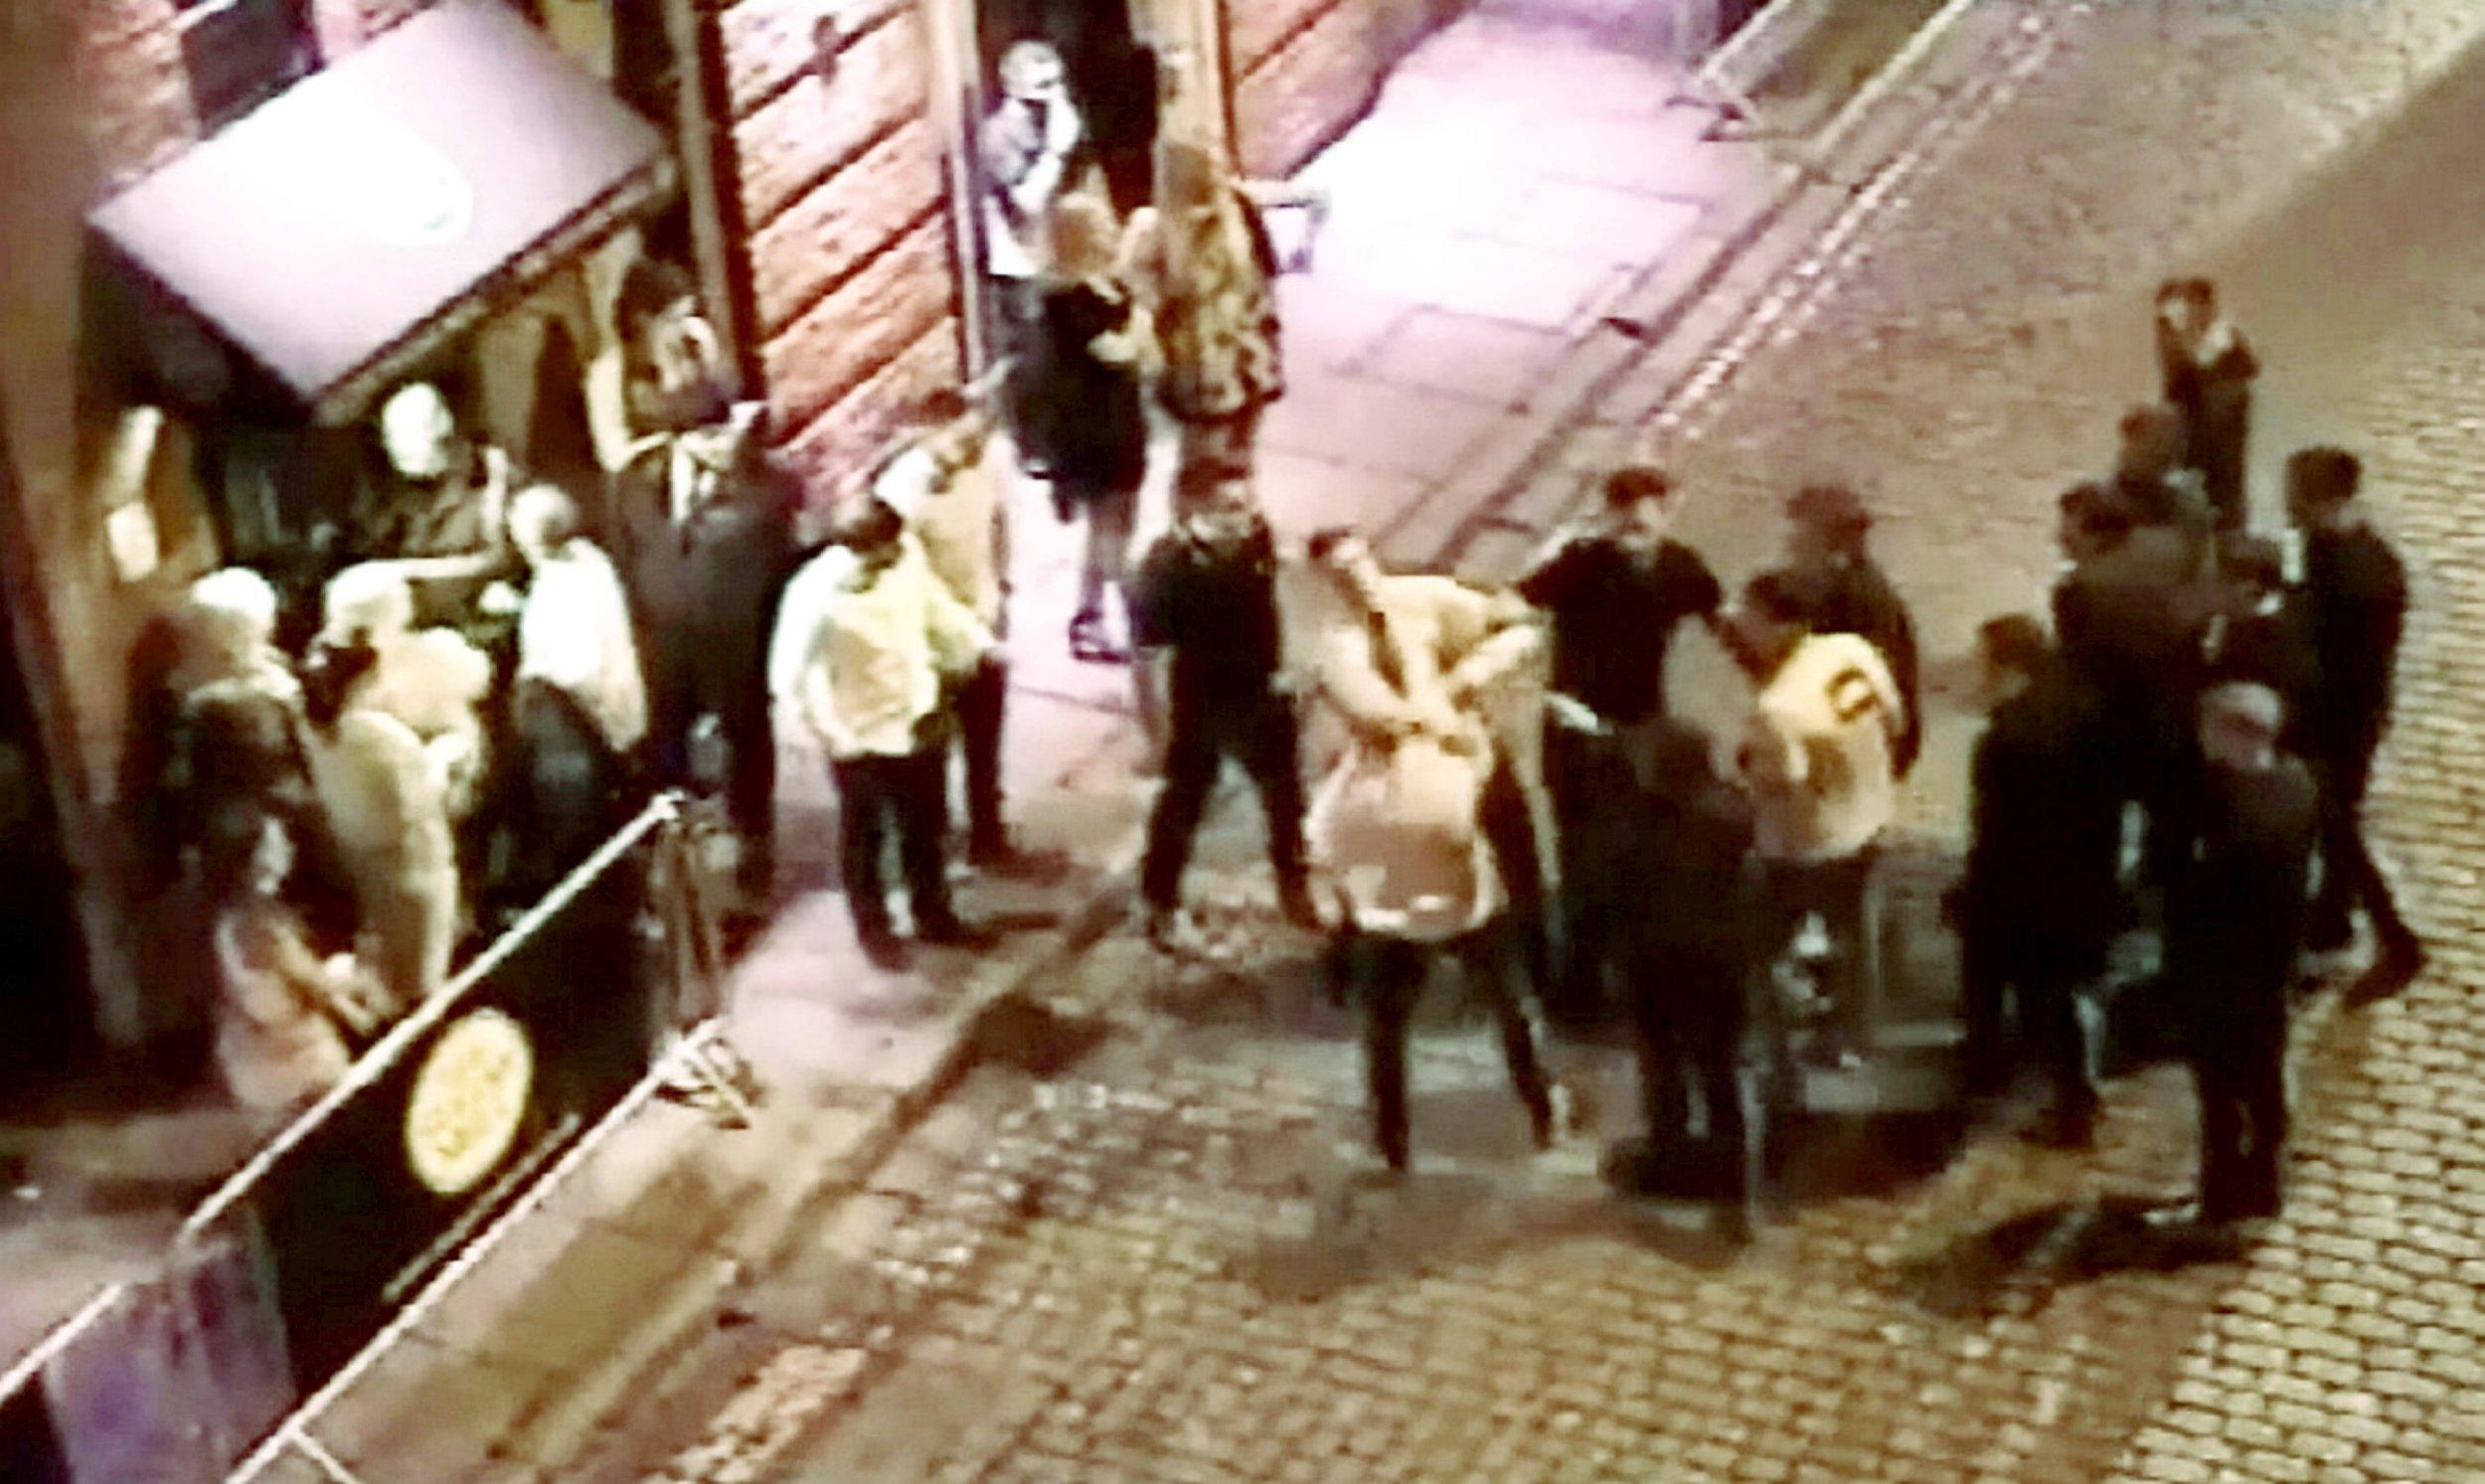 Football fans clash in shocking CCTV footage filmed outside nightclub